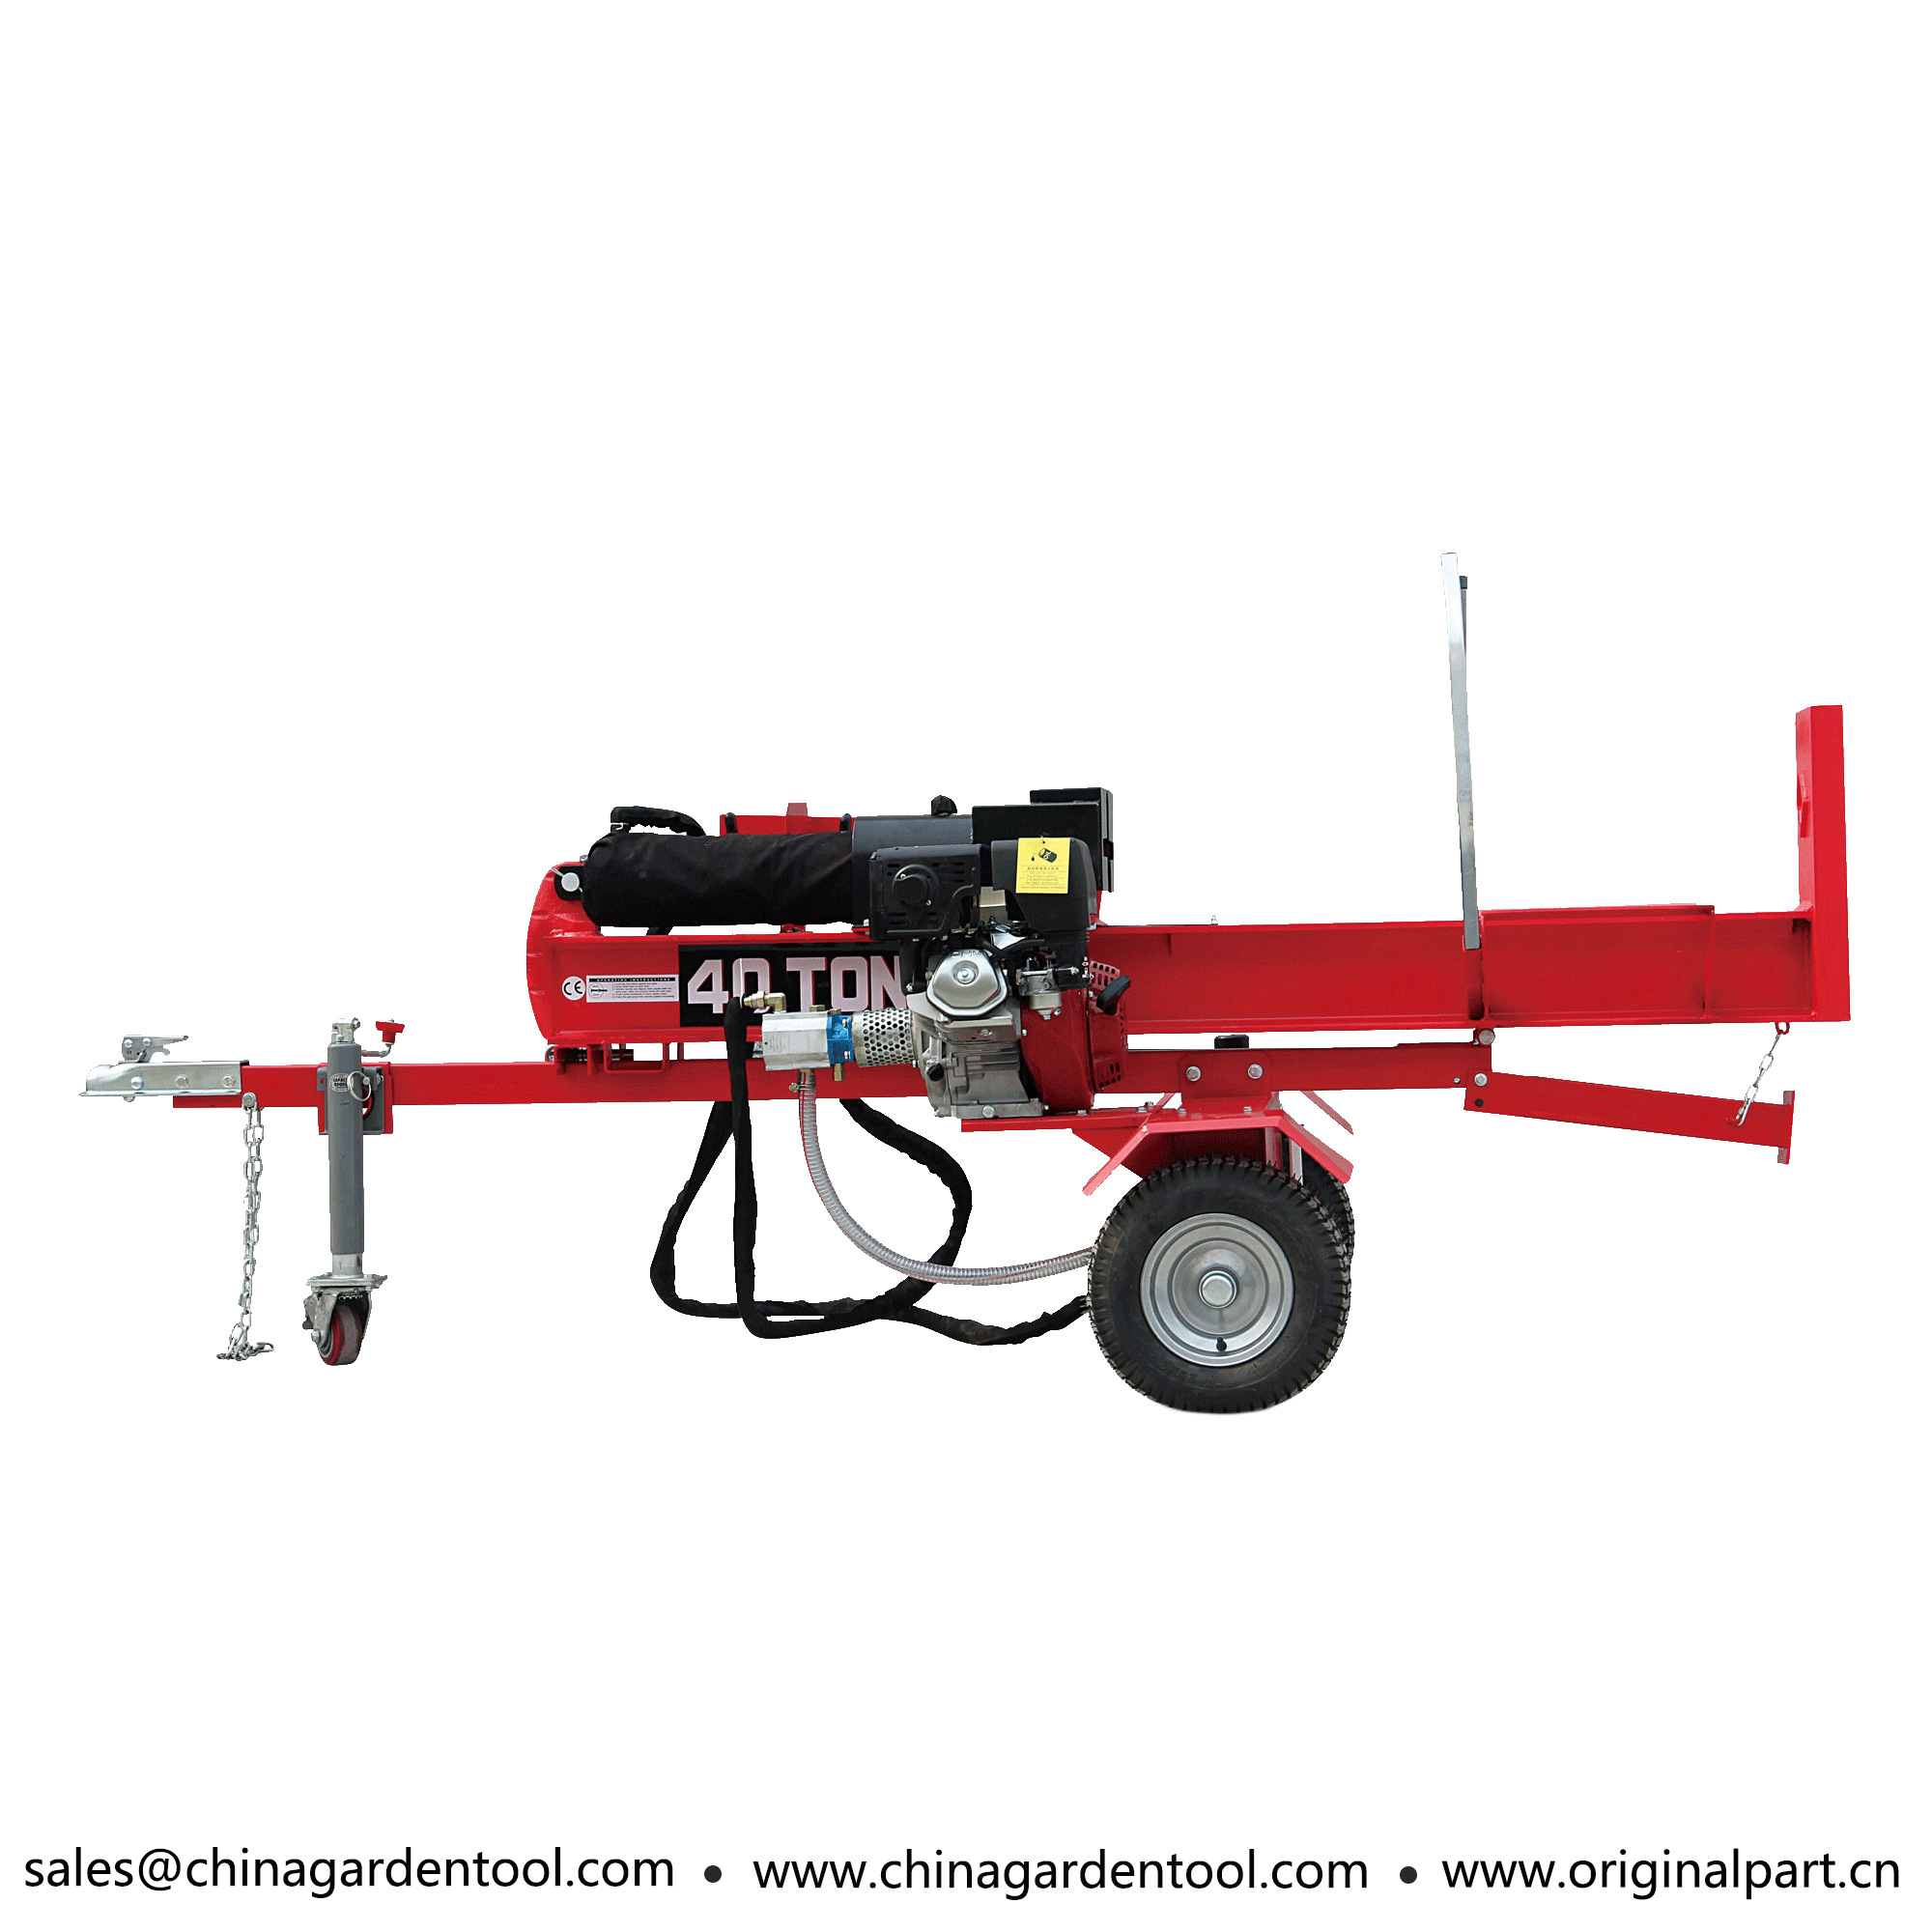 China Automatic Honda Engine Manual Start Petrol Log Splitter - China Log  Splitter, Woodworking Machine